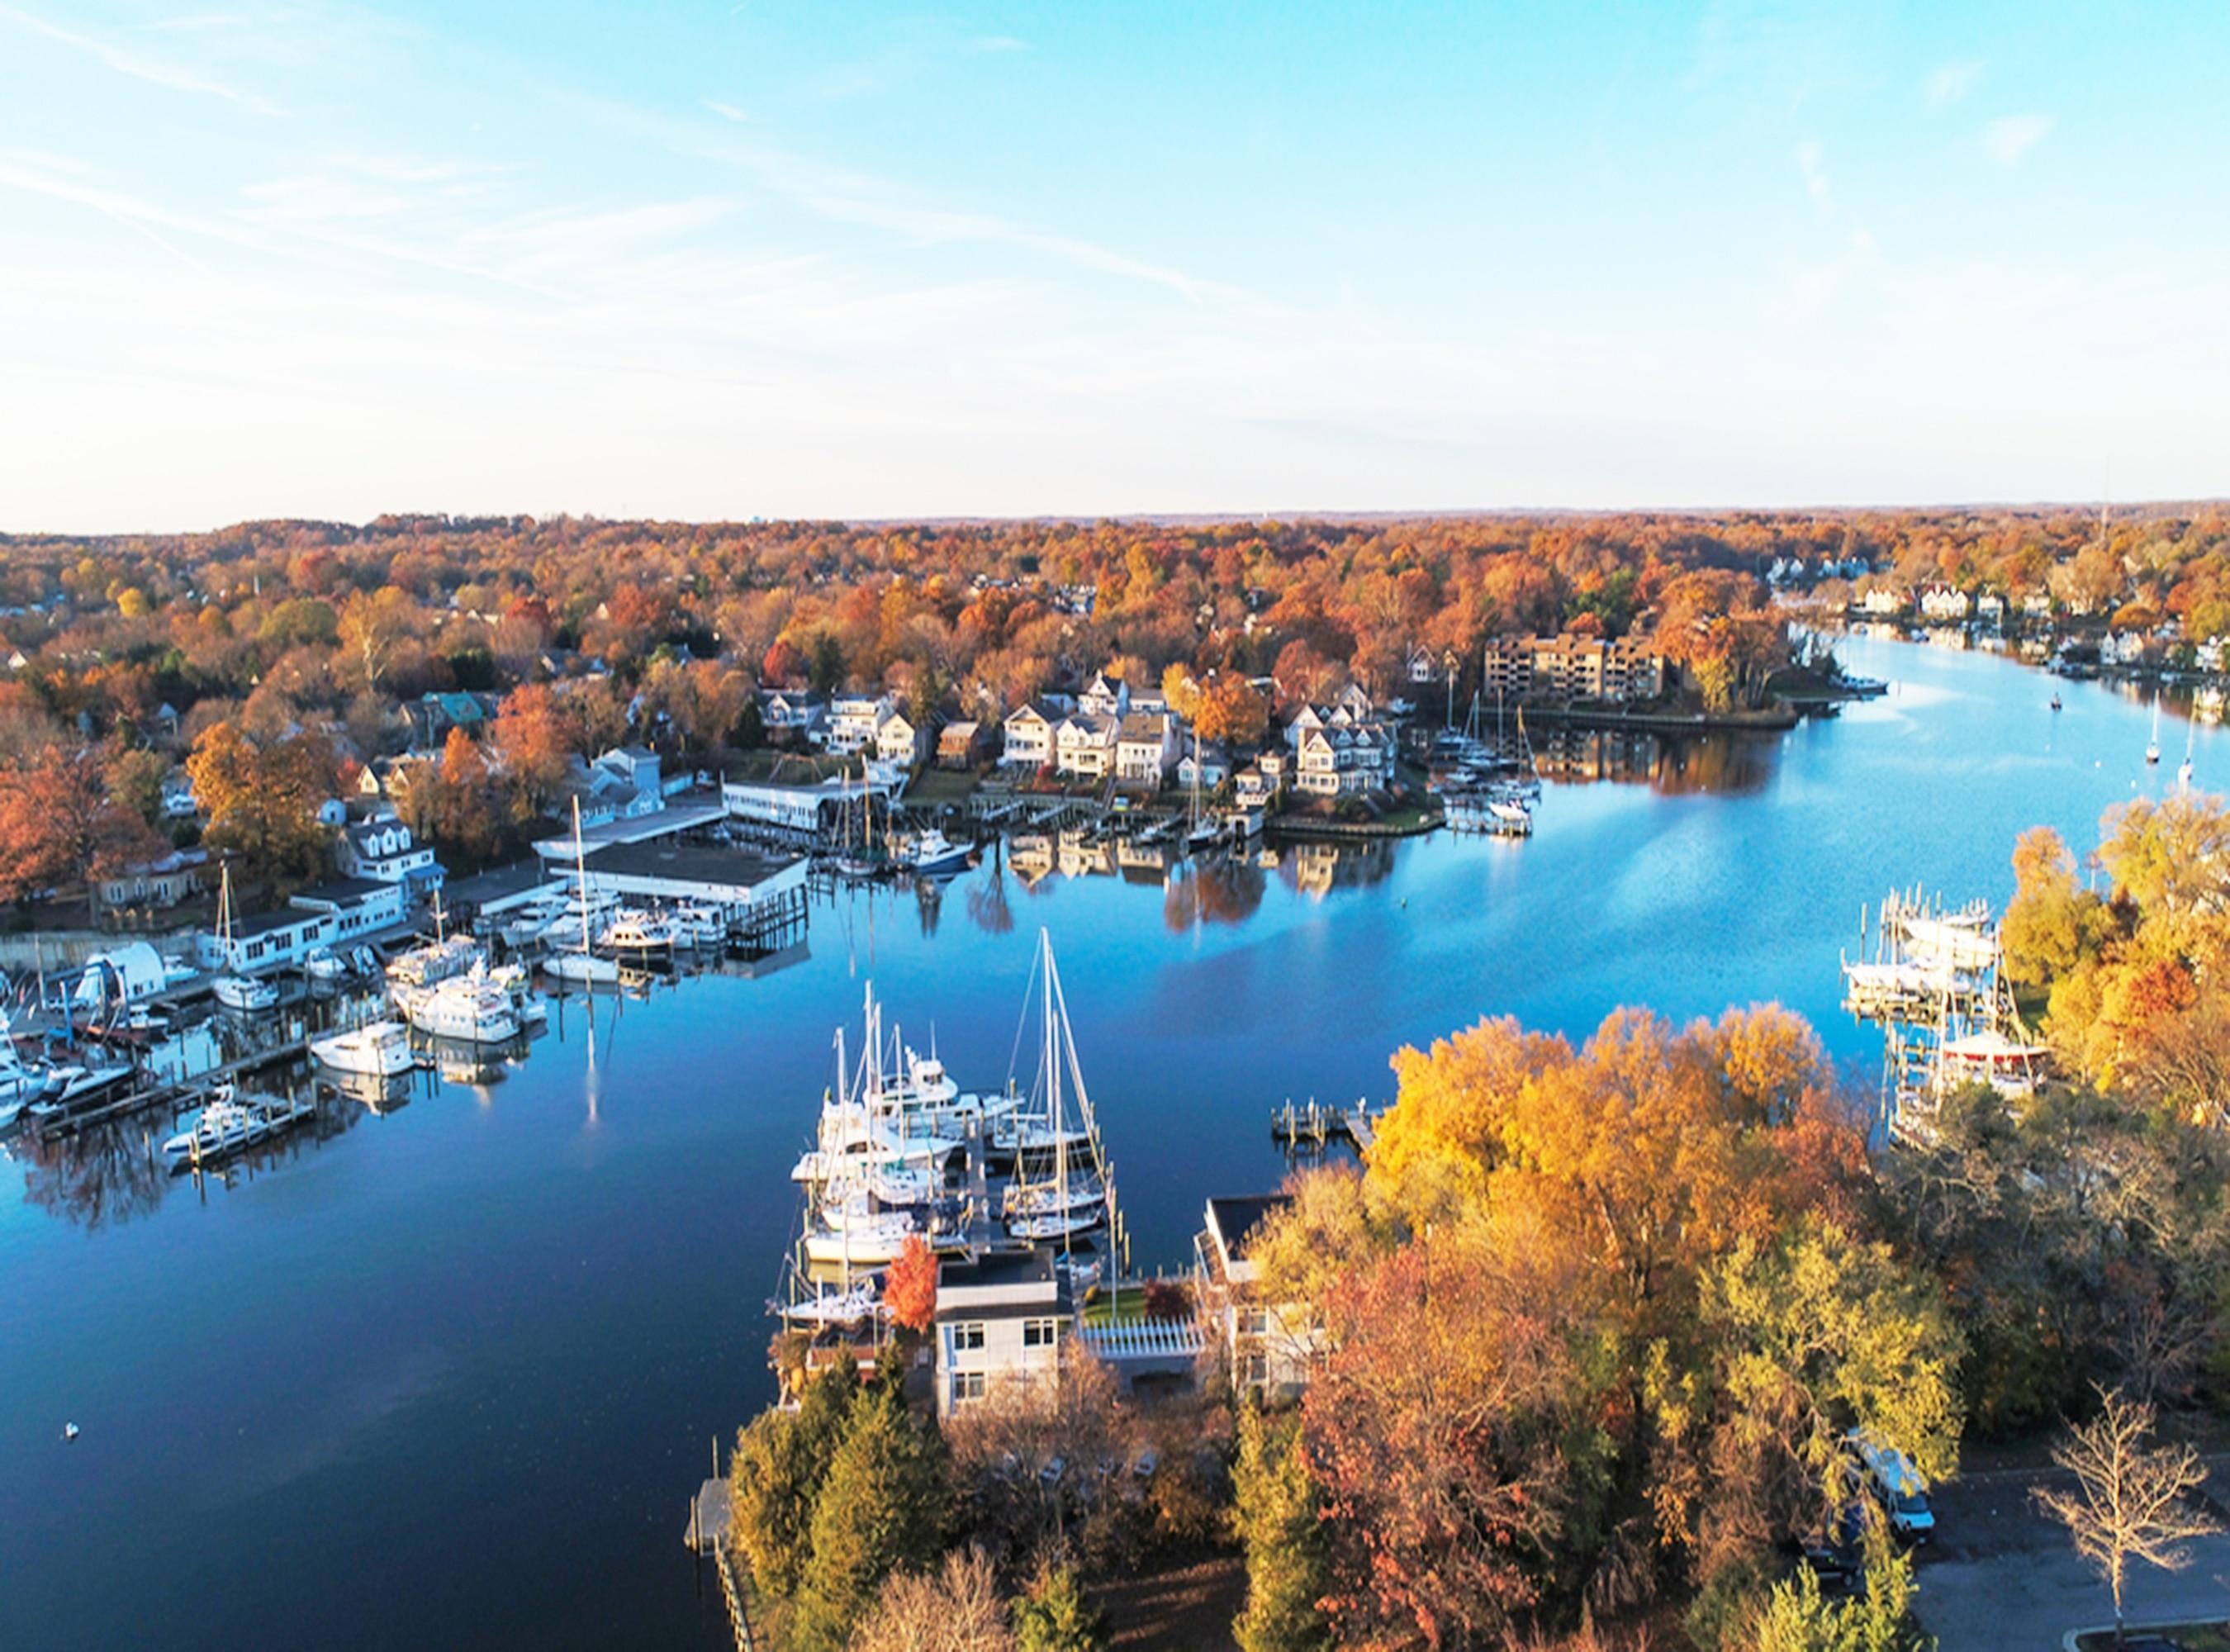 Hrabstwo Cecil, Maryland, Stany Zjednoczone